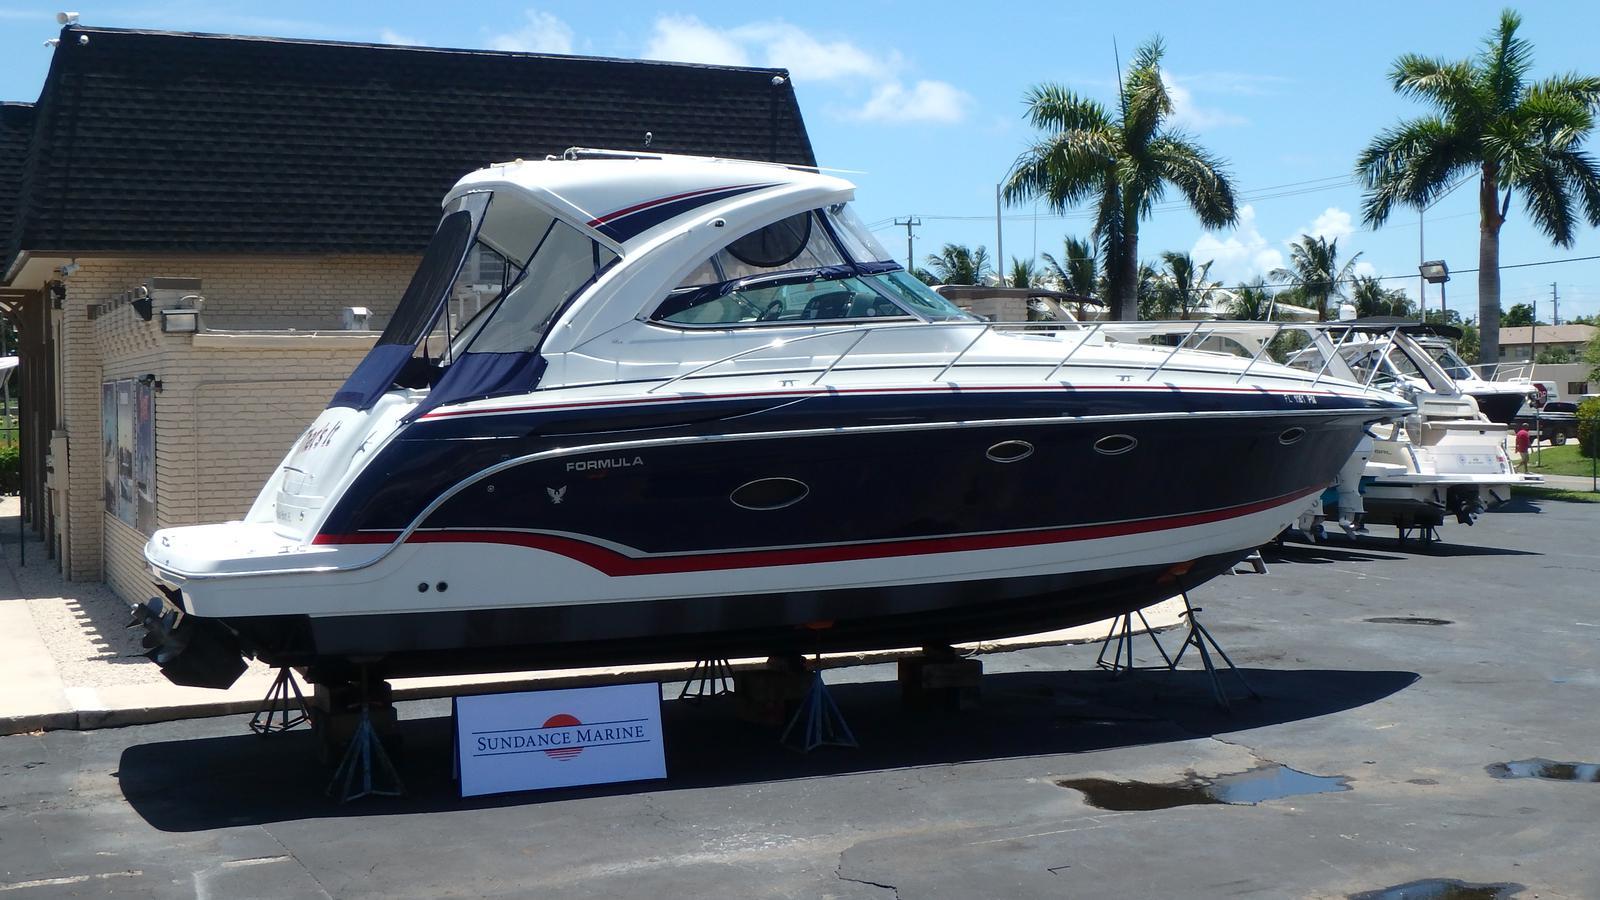 2013 Formula 37 Pc For Sale In Pompano Beach Fl Sundance Marine Boat Wiring Diagram Stuart Jensen 772 675 1913